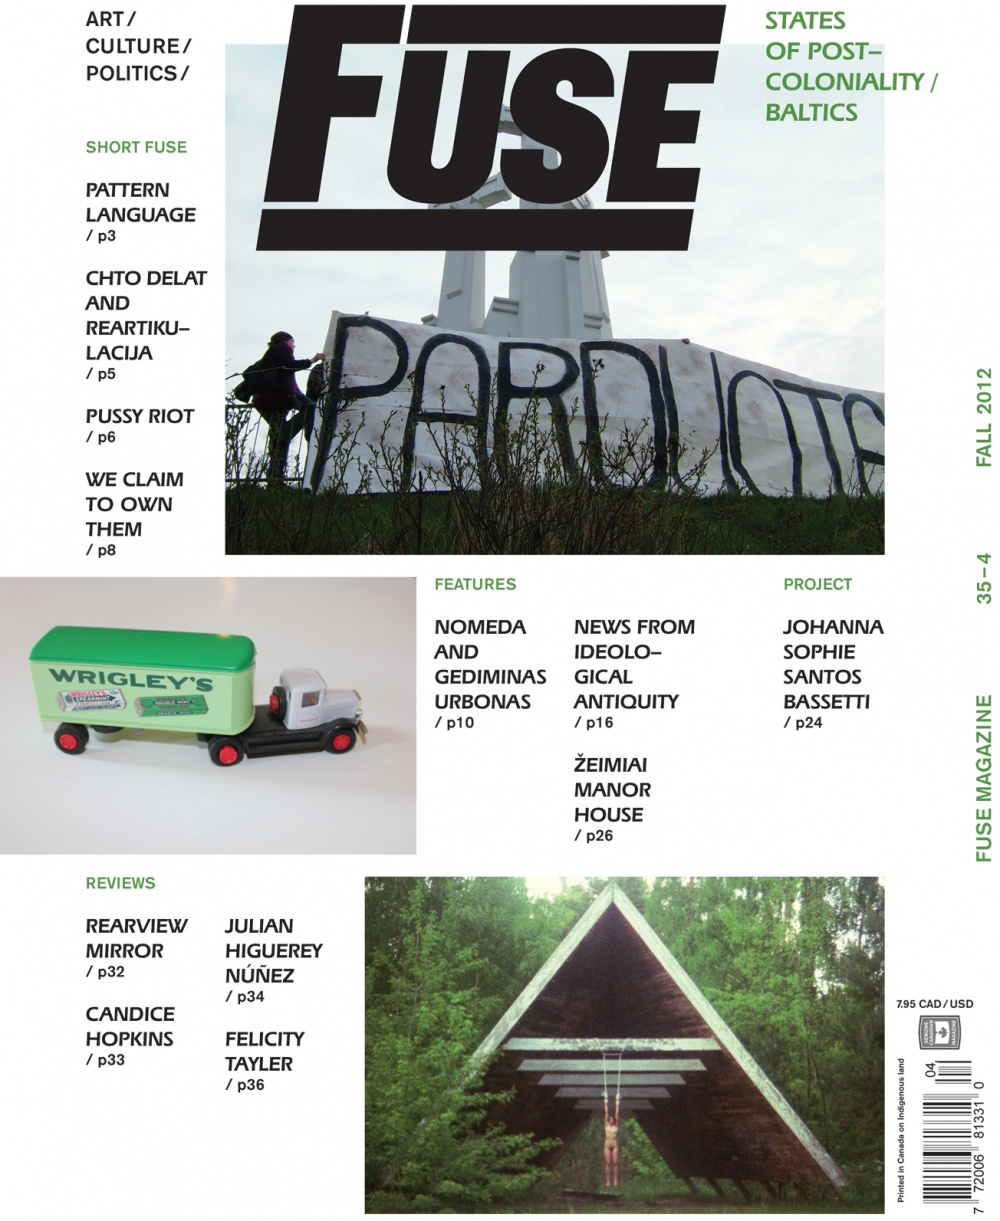 Fuse Magazine 35-4: States of Postcoloniality/BALTICS (Fall 2012